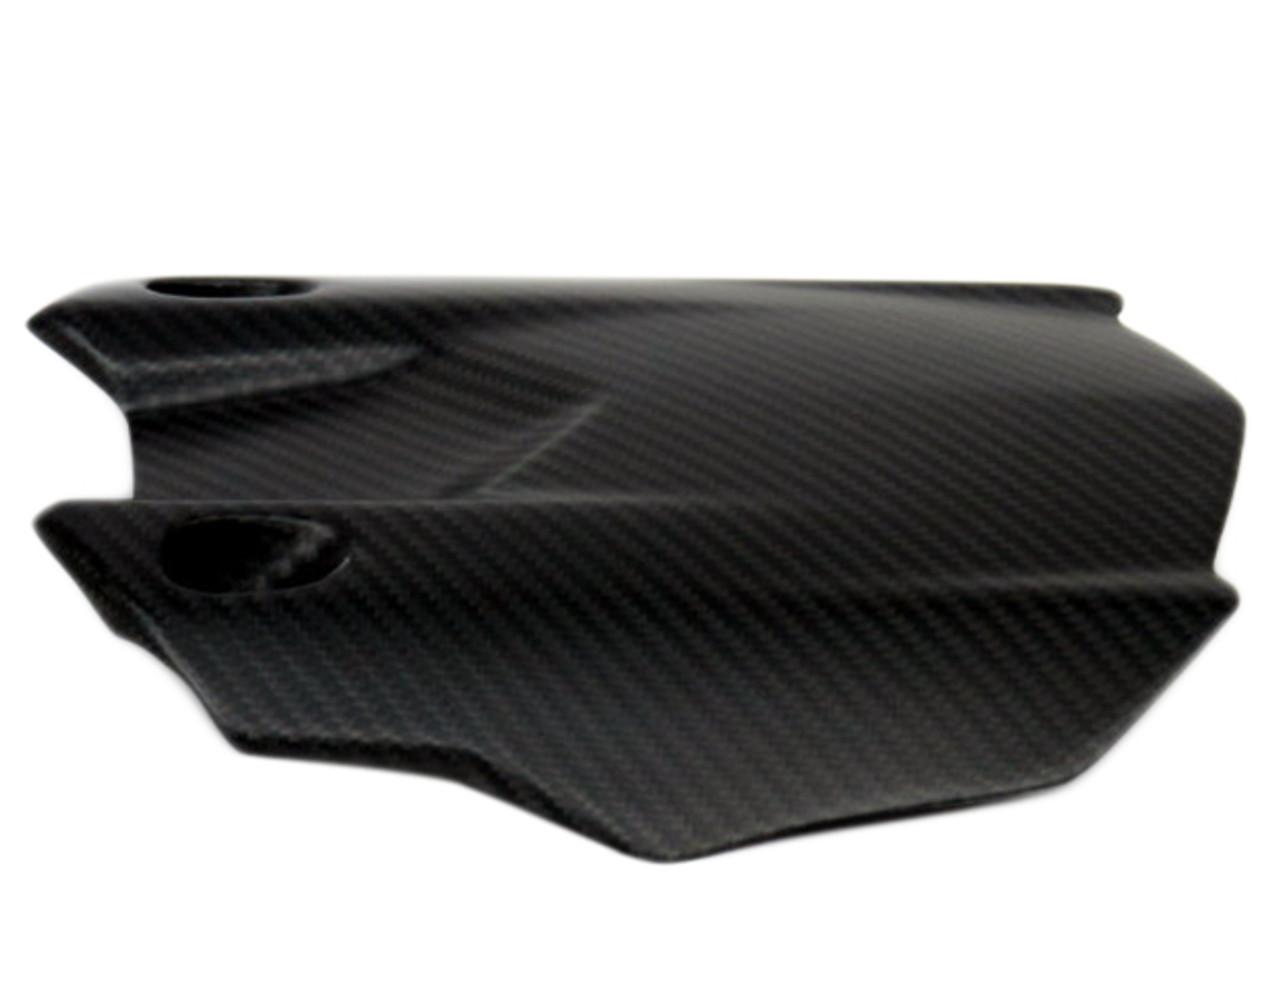 Rear Hugger in Matte Twill Weave Carbon Fiber for Yamaha R1 2015+, FZ-10/MT-10 2017+